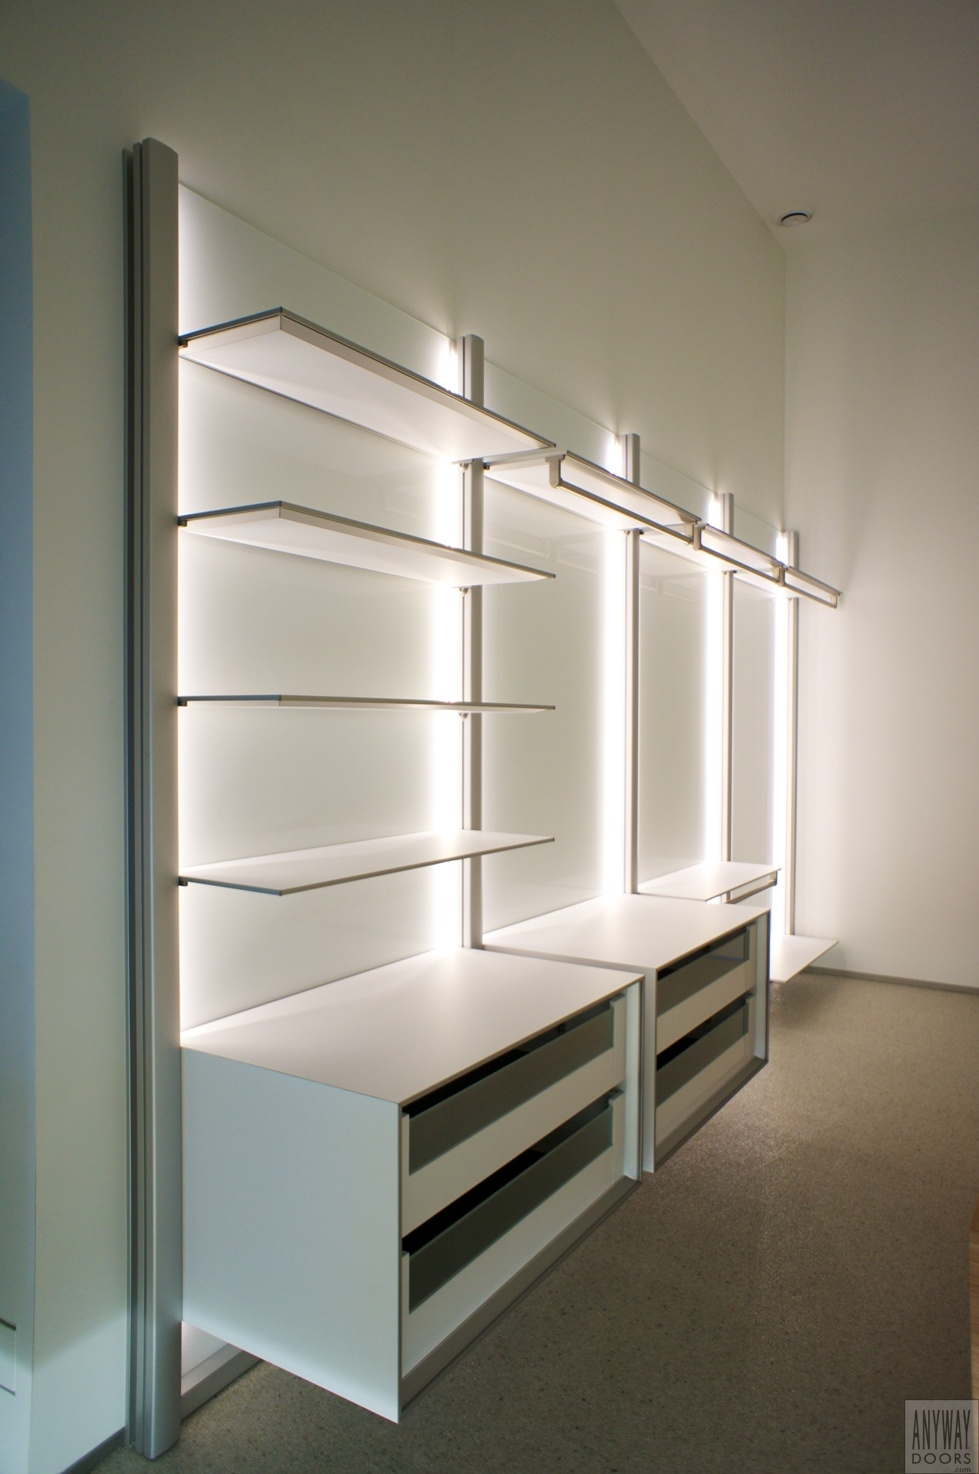 Verlichting slaapkamer design ~ [spscents.com]